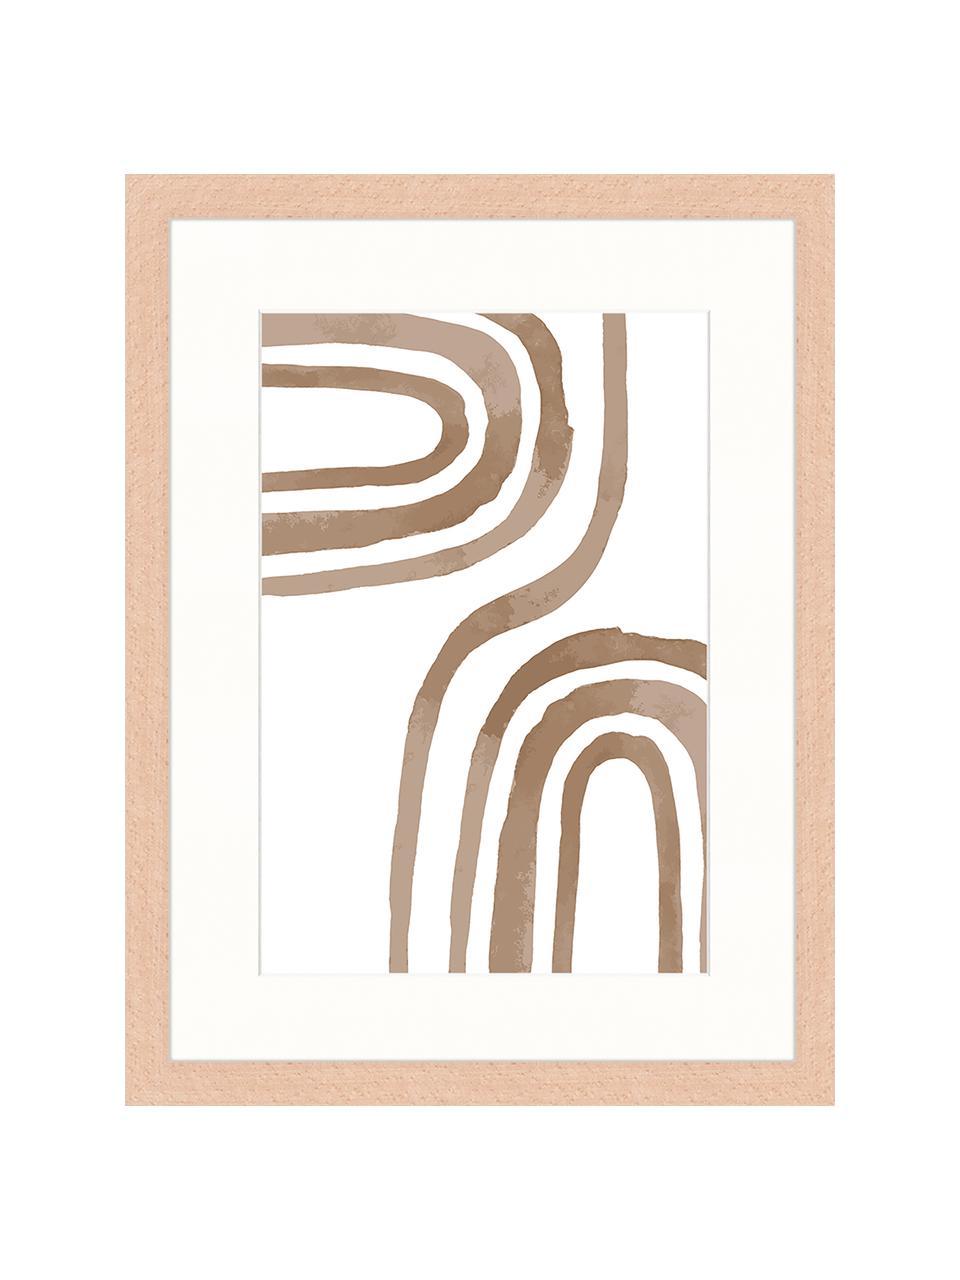 Ingelijste digitale print Modern Poster, Afbeelding: digitale print op papier,, Lijst: gelakt hout, Bruin, wit, 33 x 43 cm